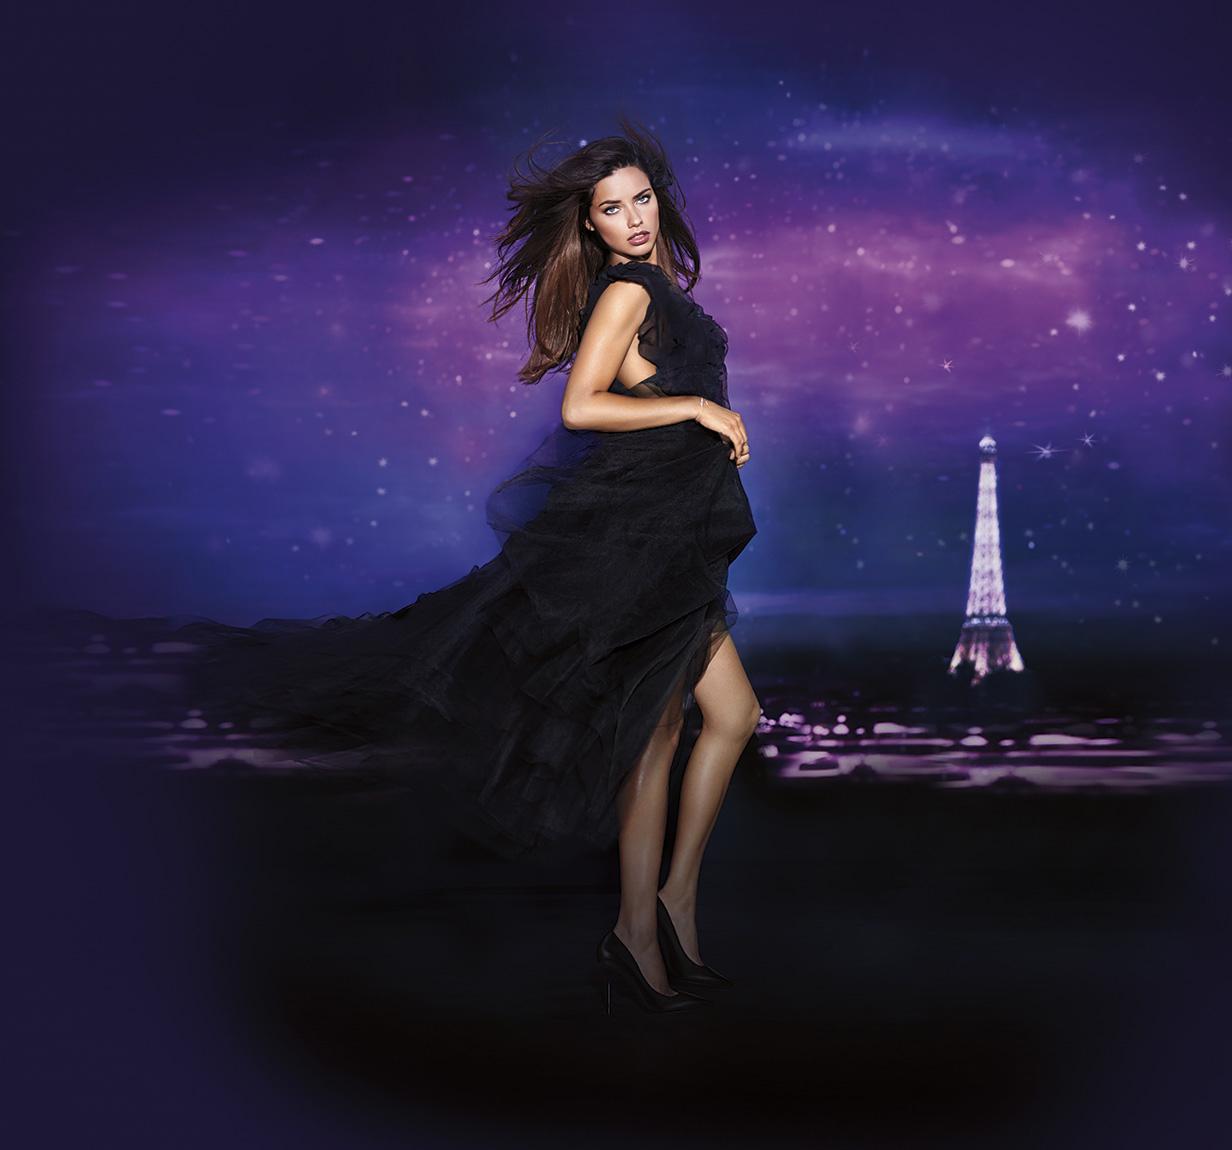 beauty-night-2013-adriana-campaign-victorias-secret-hi-res